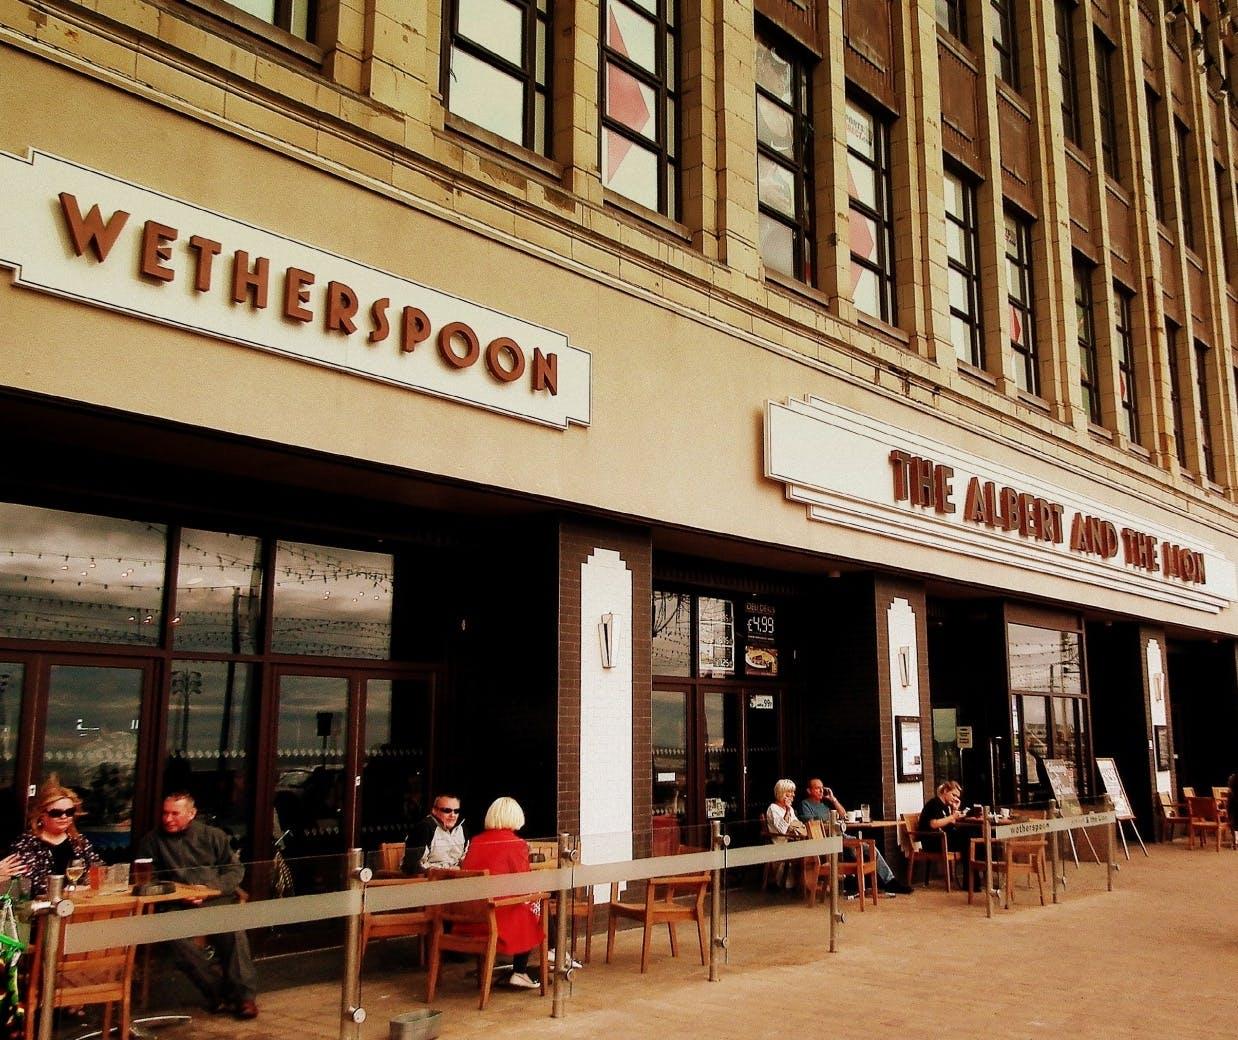 Wetherspoon pub social media